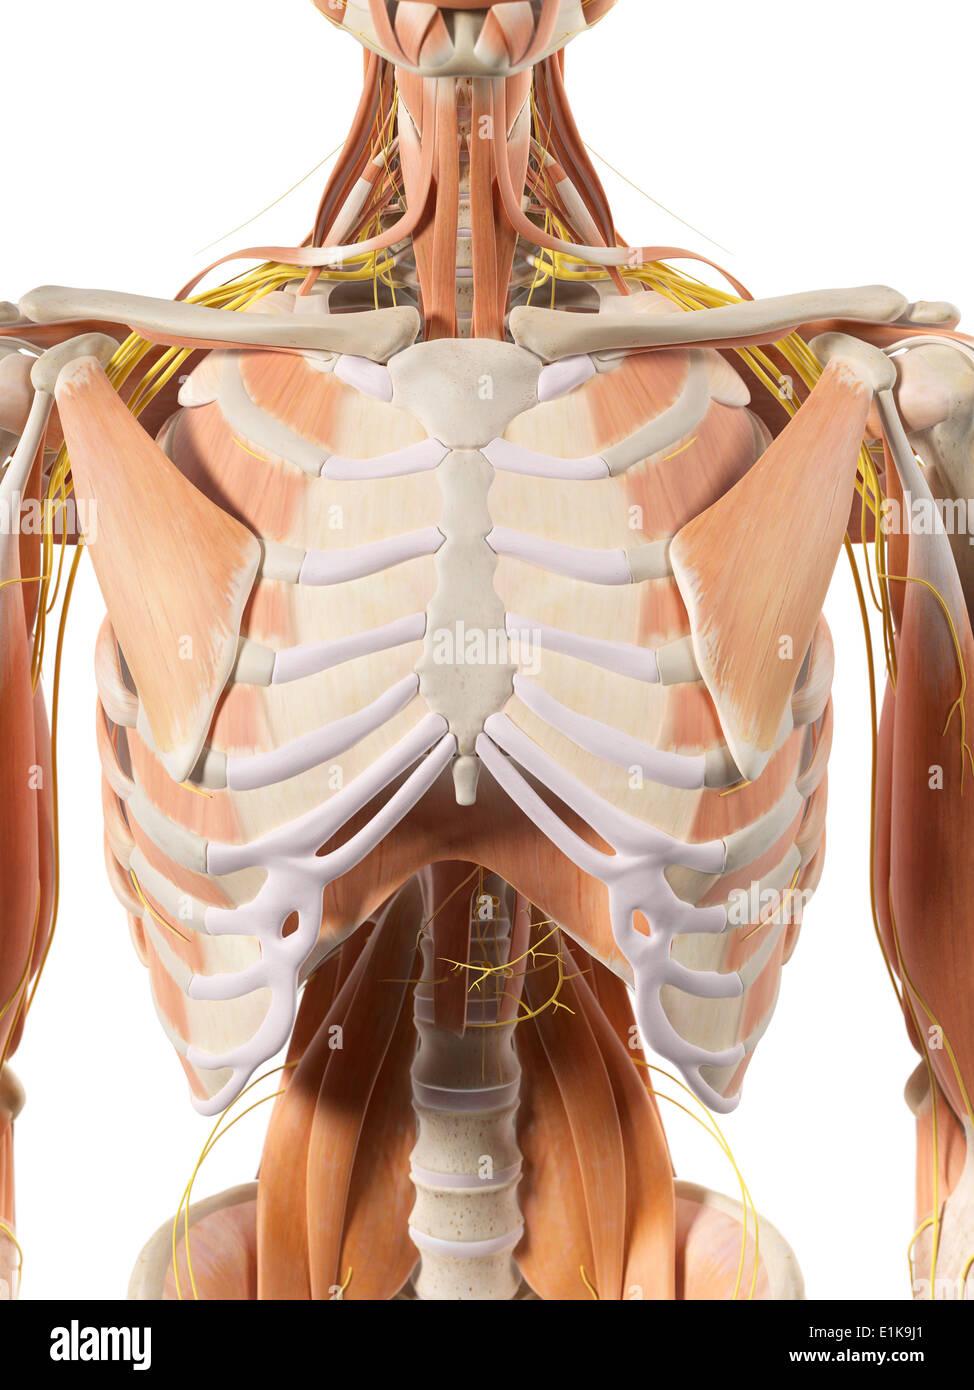 Thoracic Nerves Imágenes De Stock & Thoracic Nerves Fotos De Stock ...